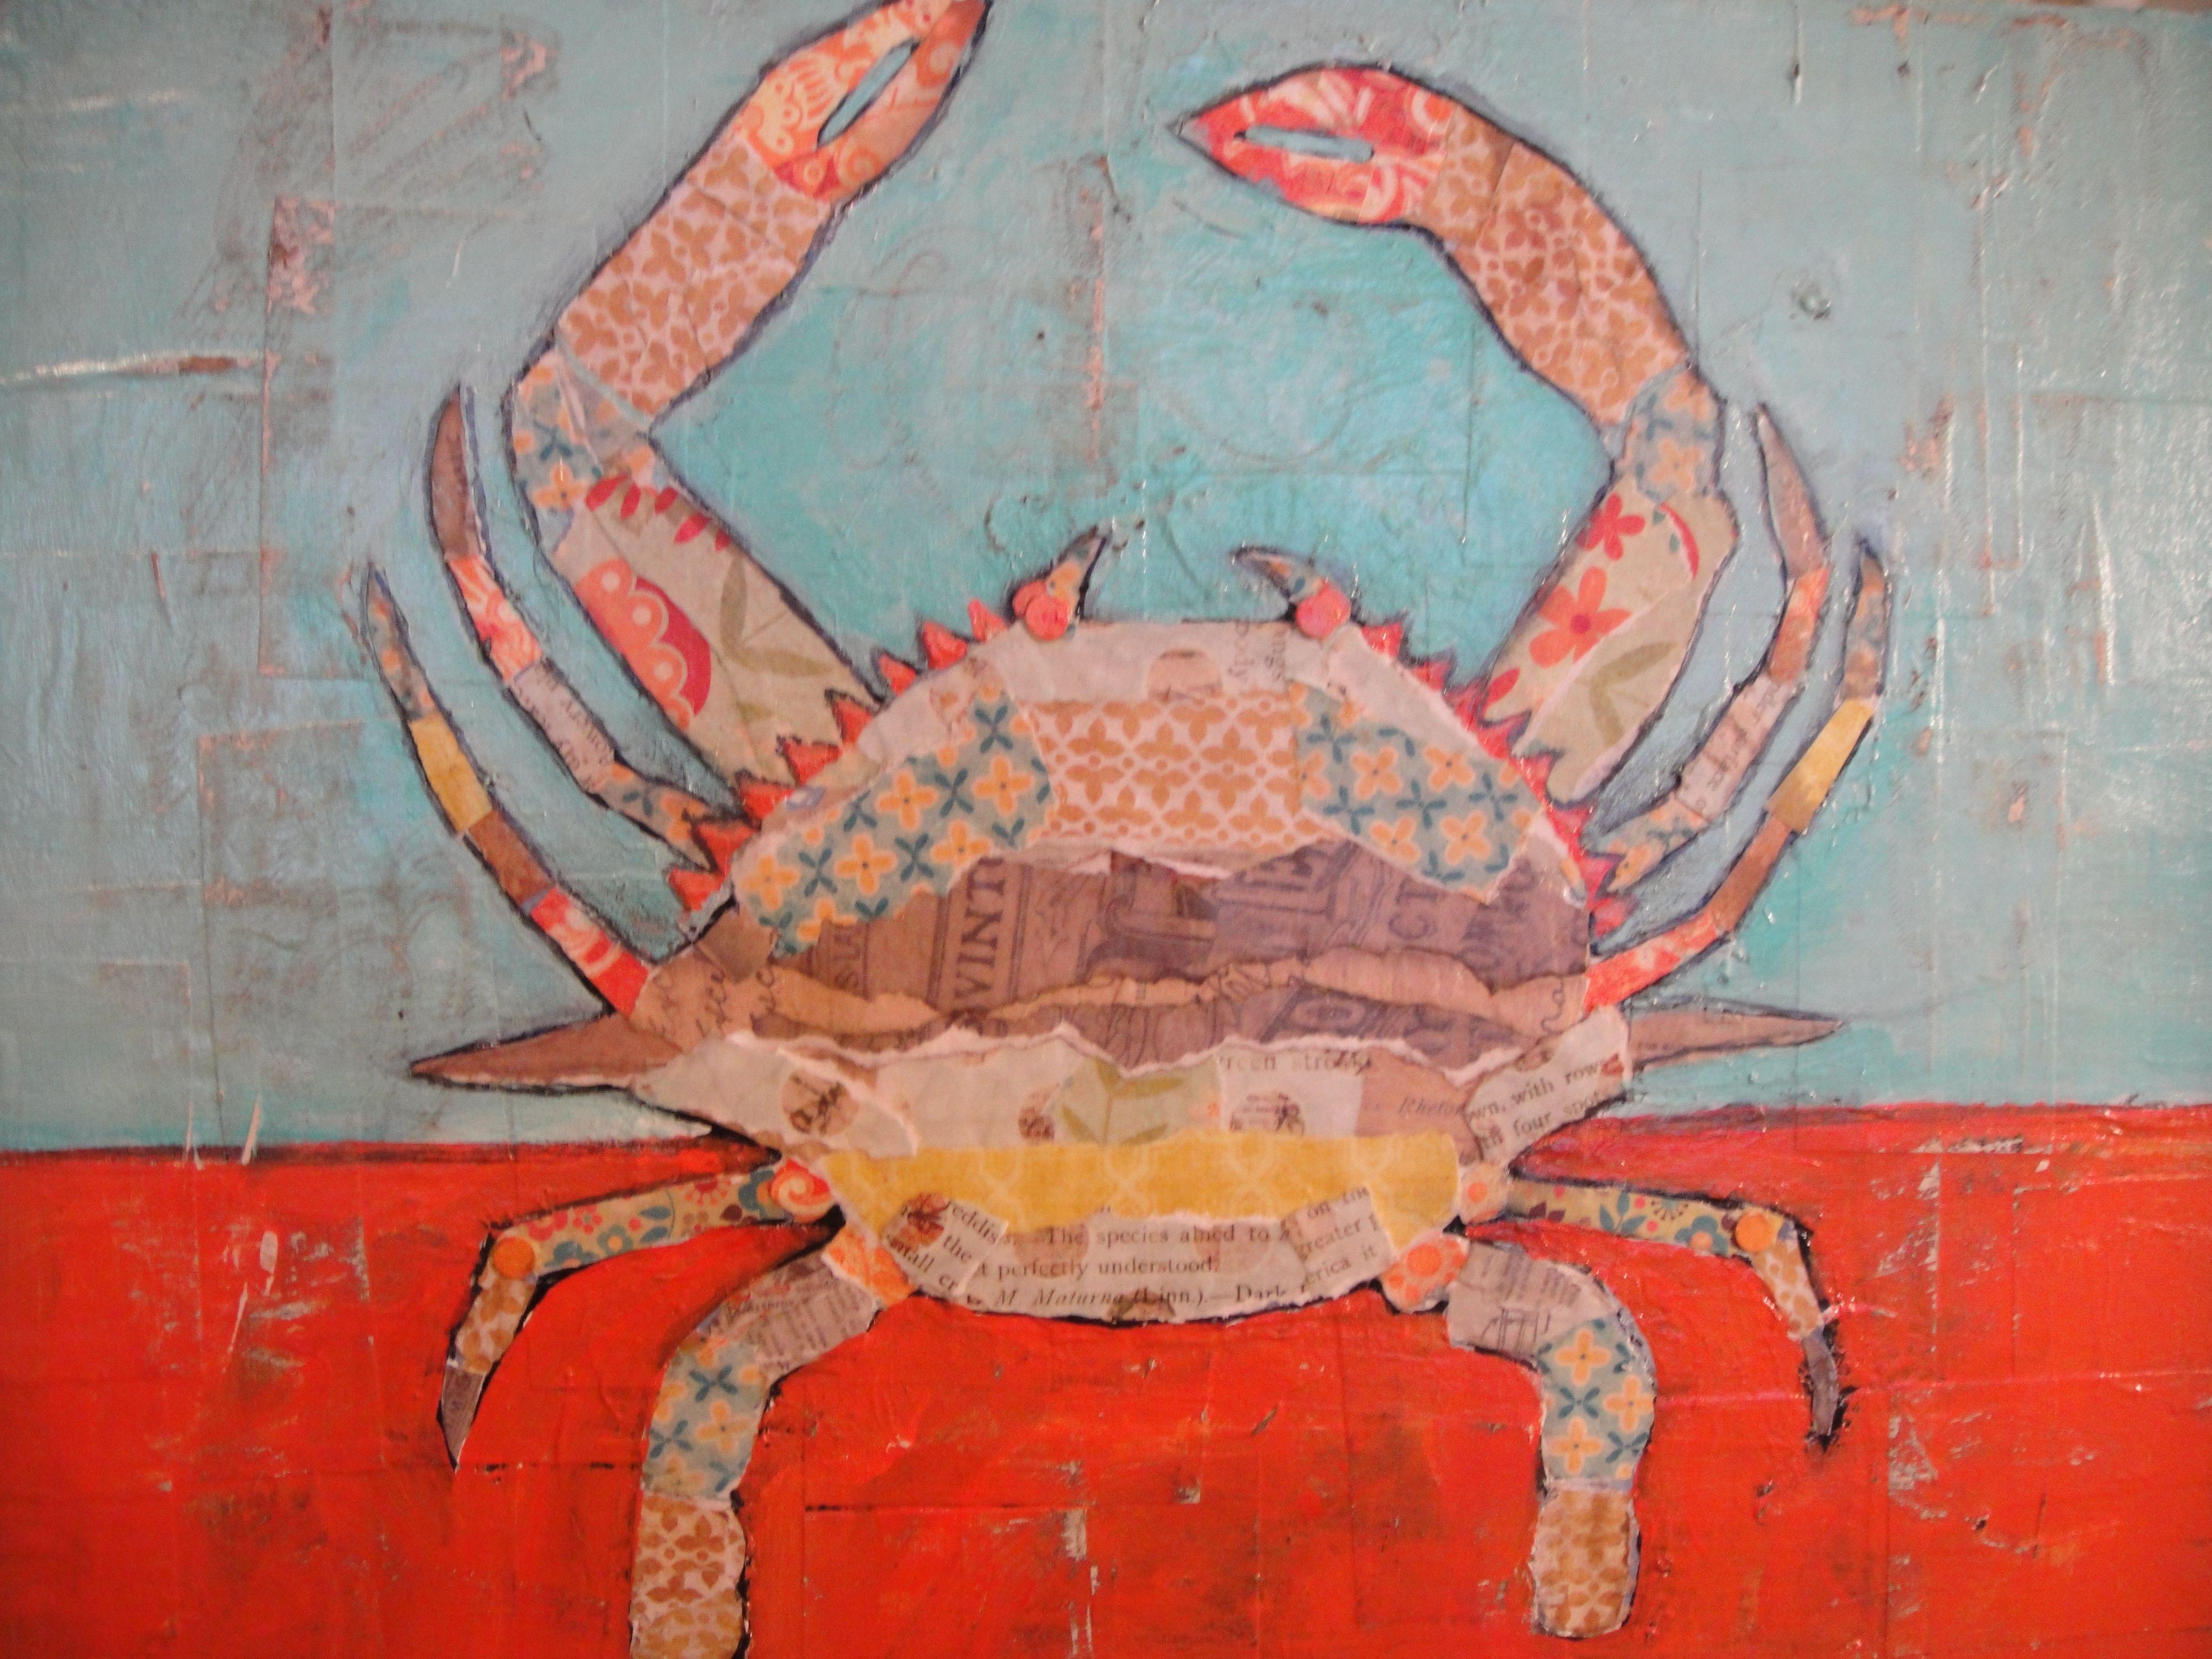 Multicolored Maryland Crab Bodegas